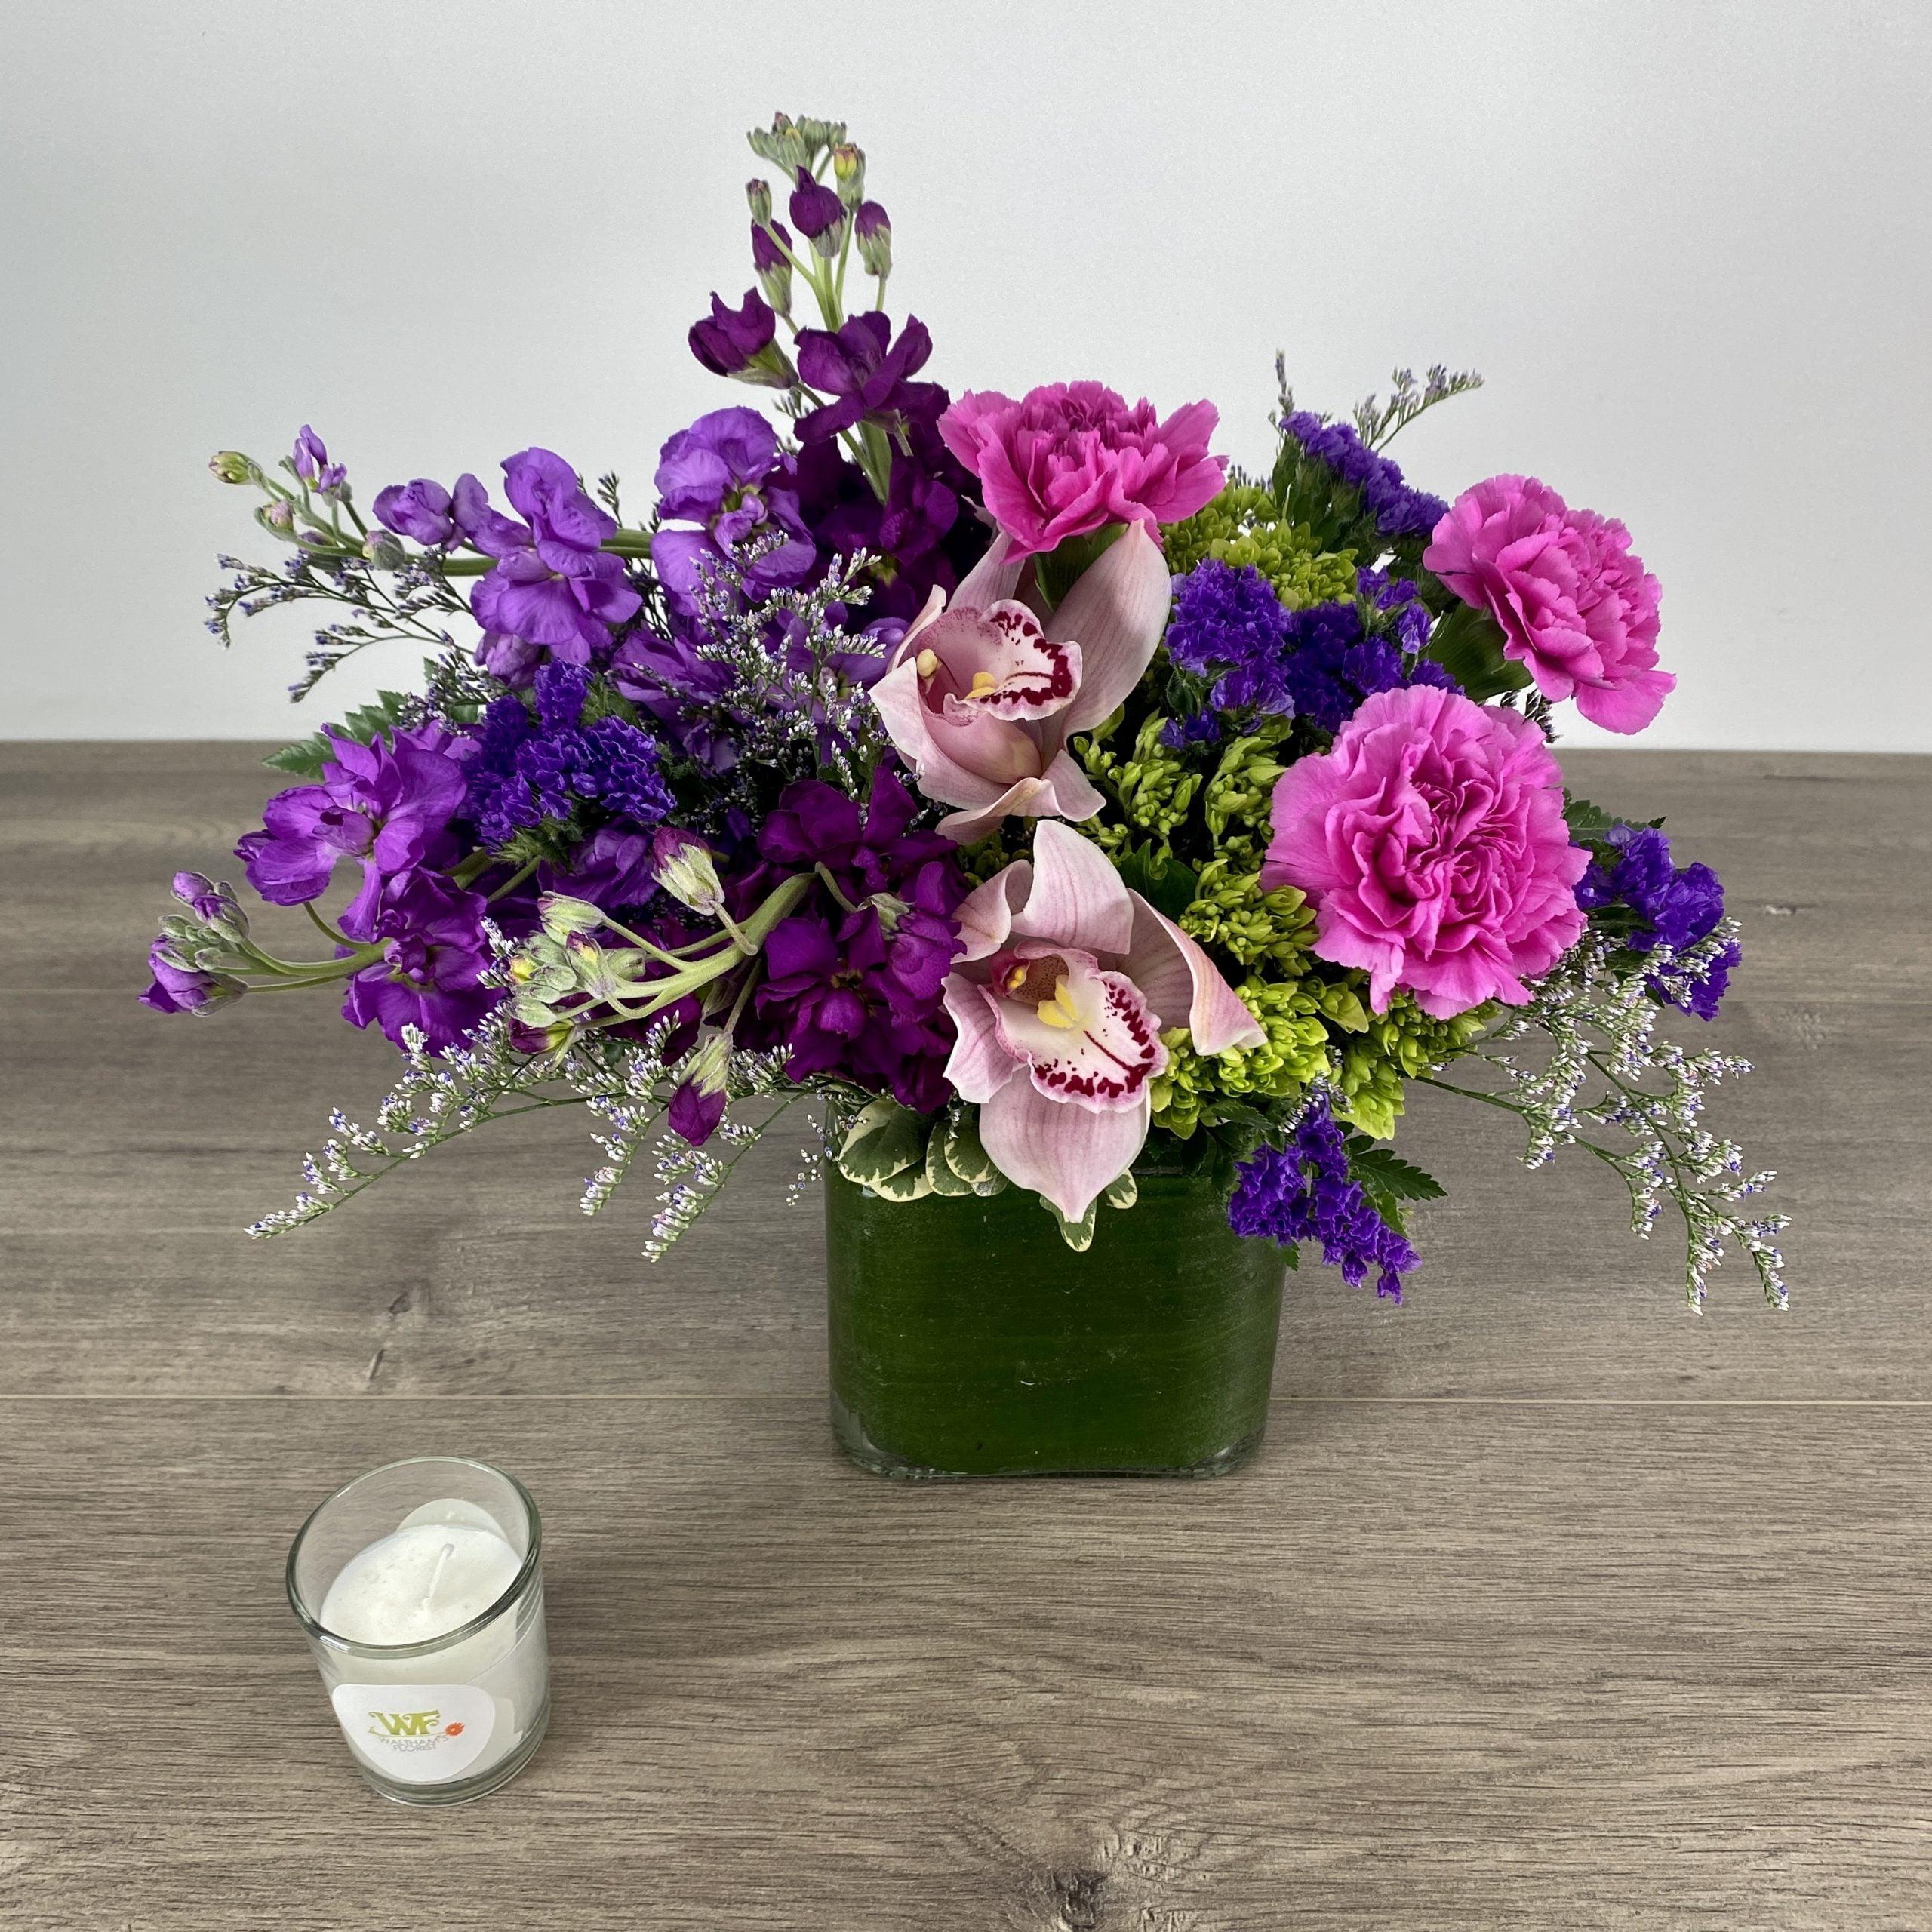 Seasonal Medium Design $75